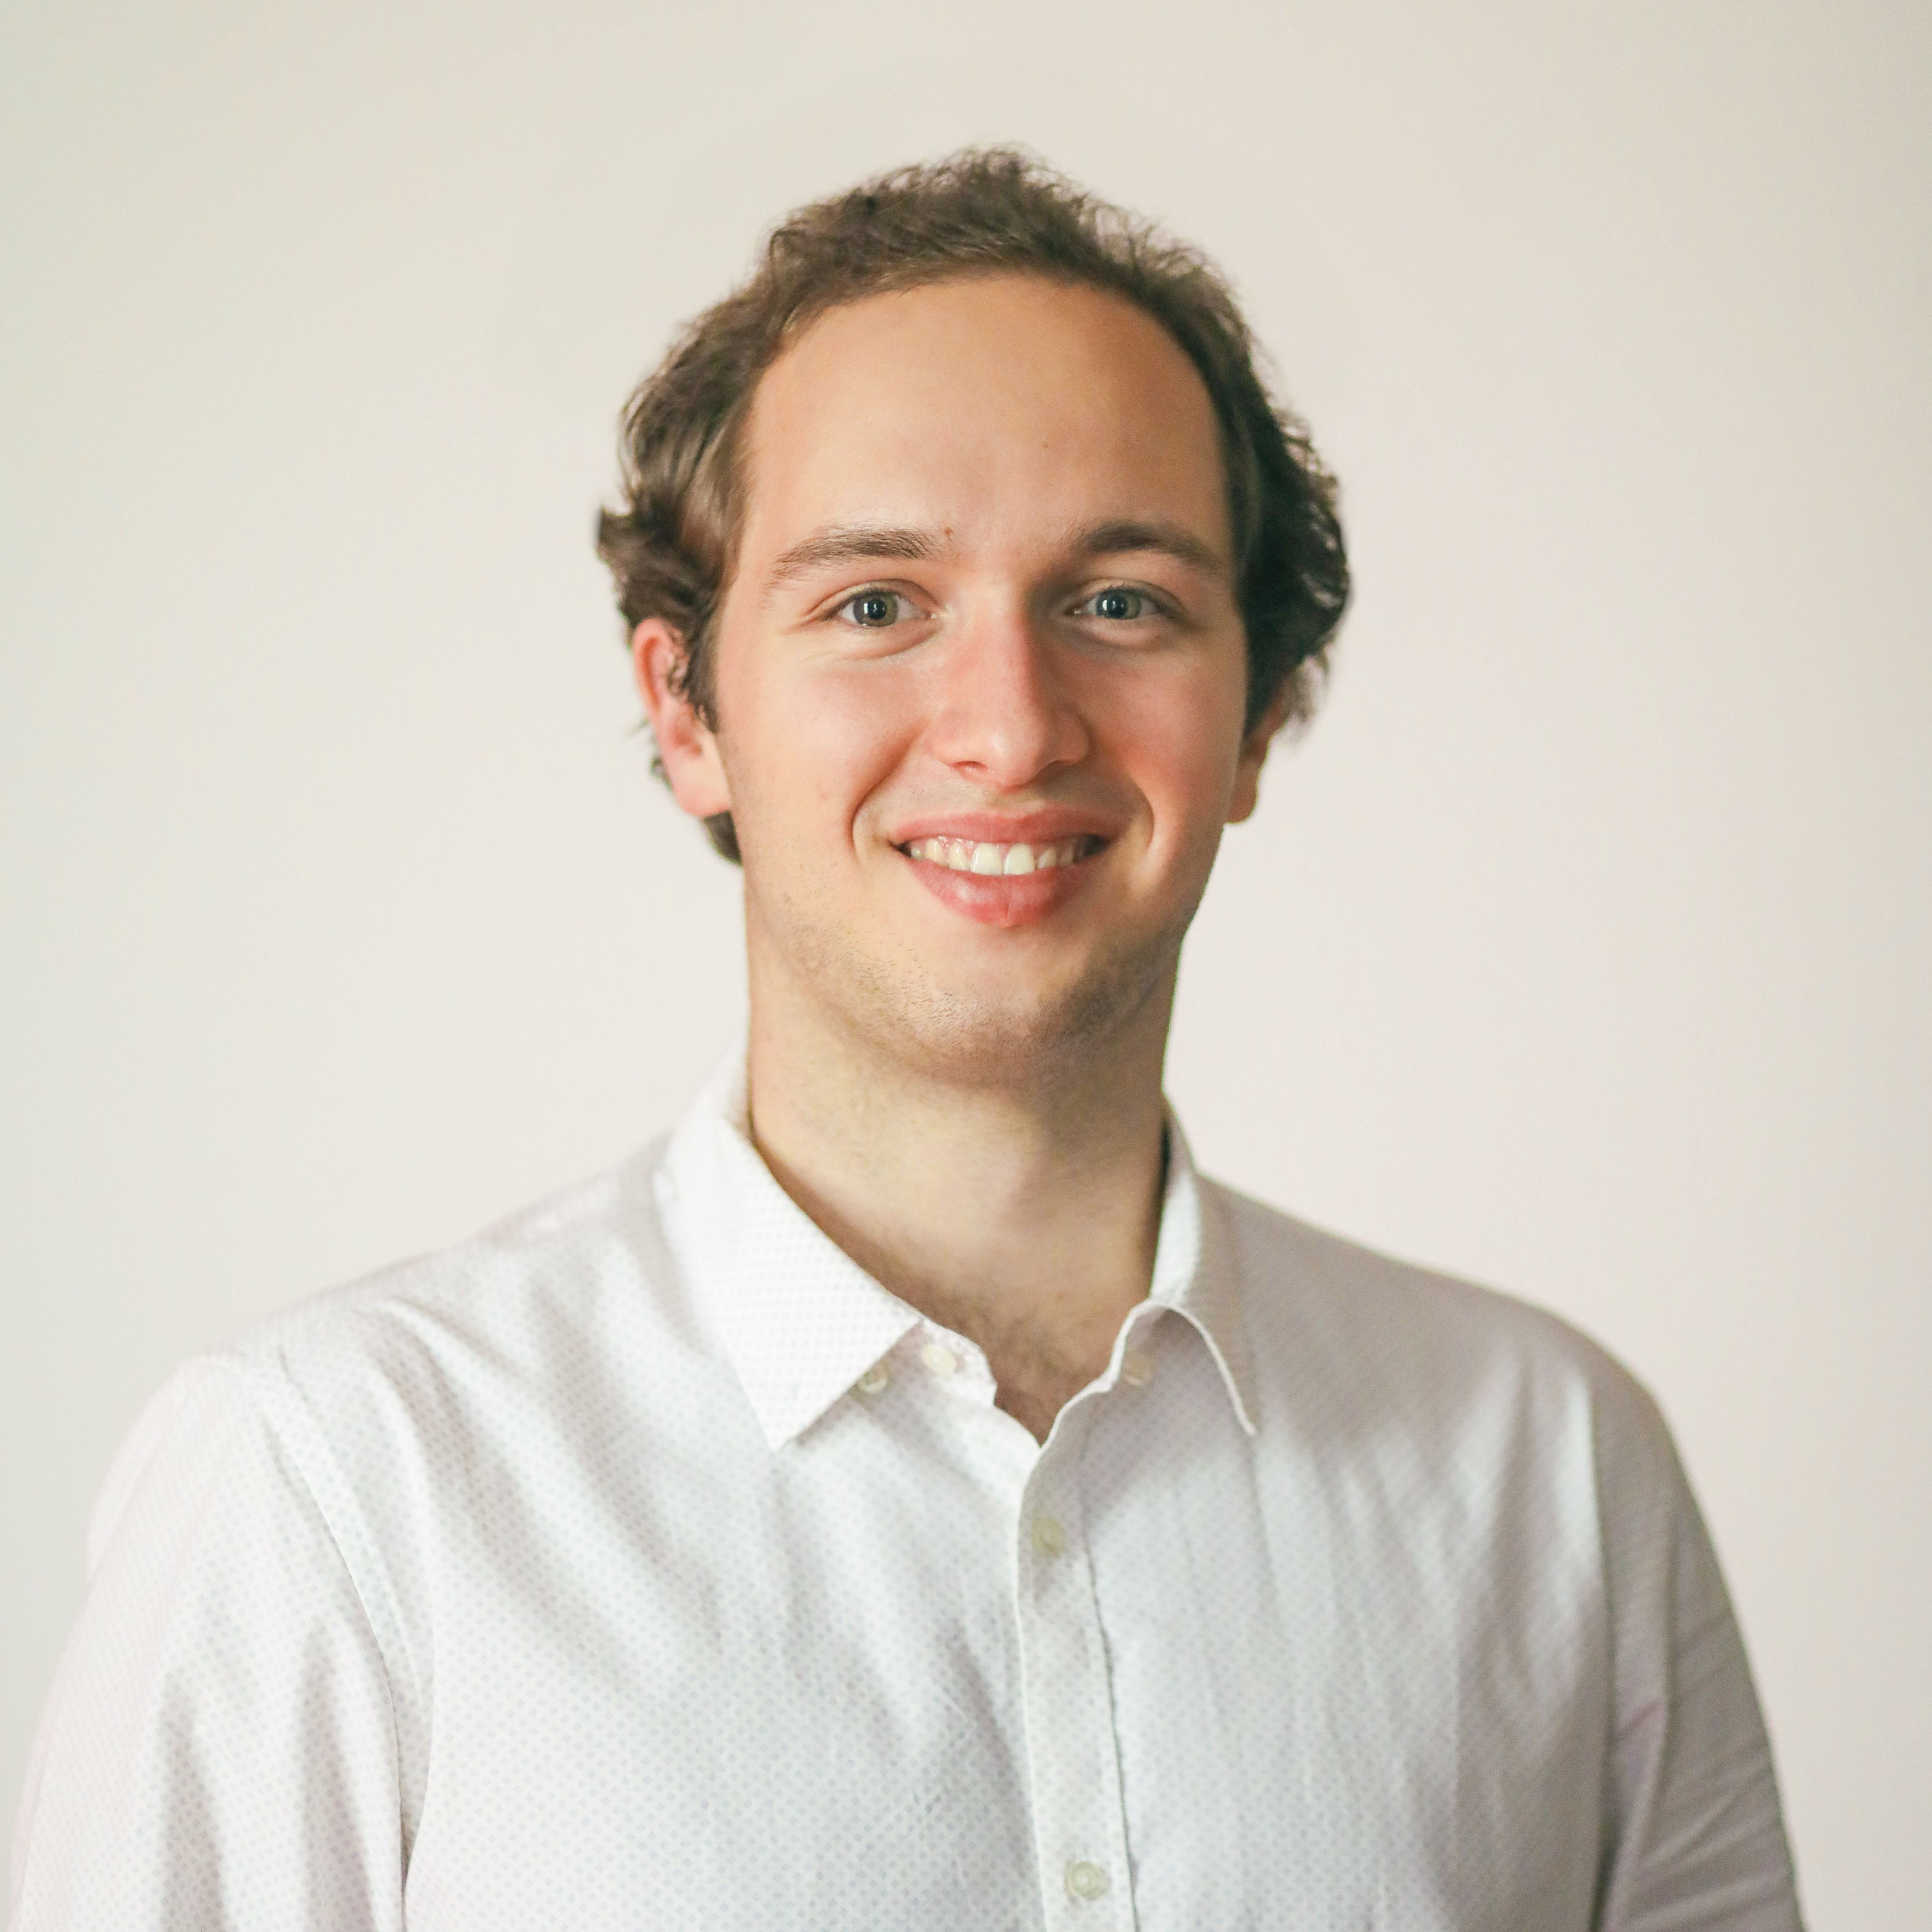 Tom Barrett - Researcher